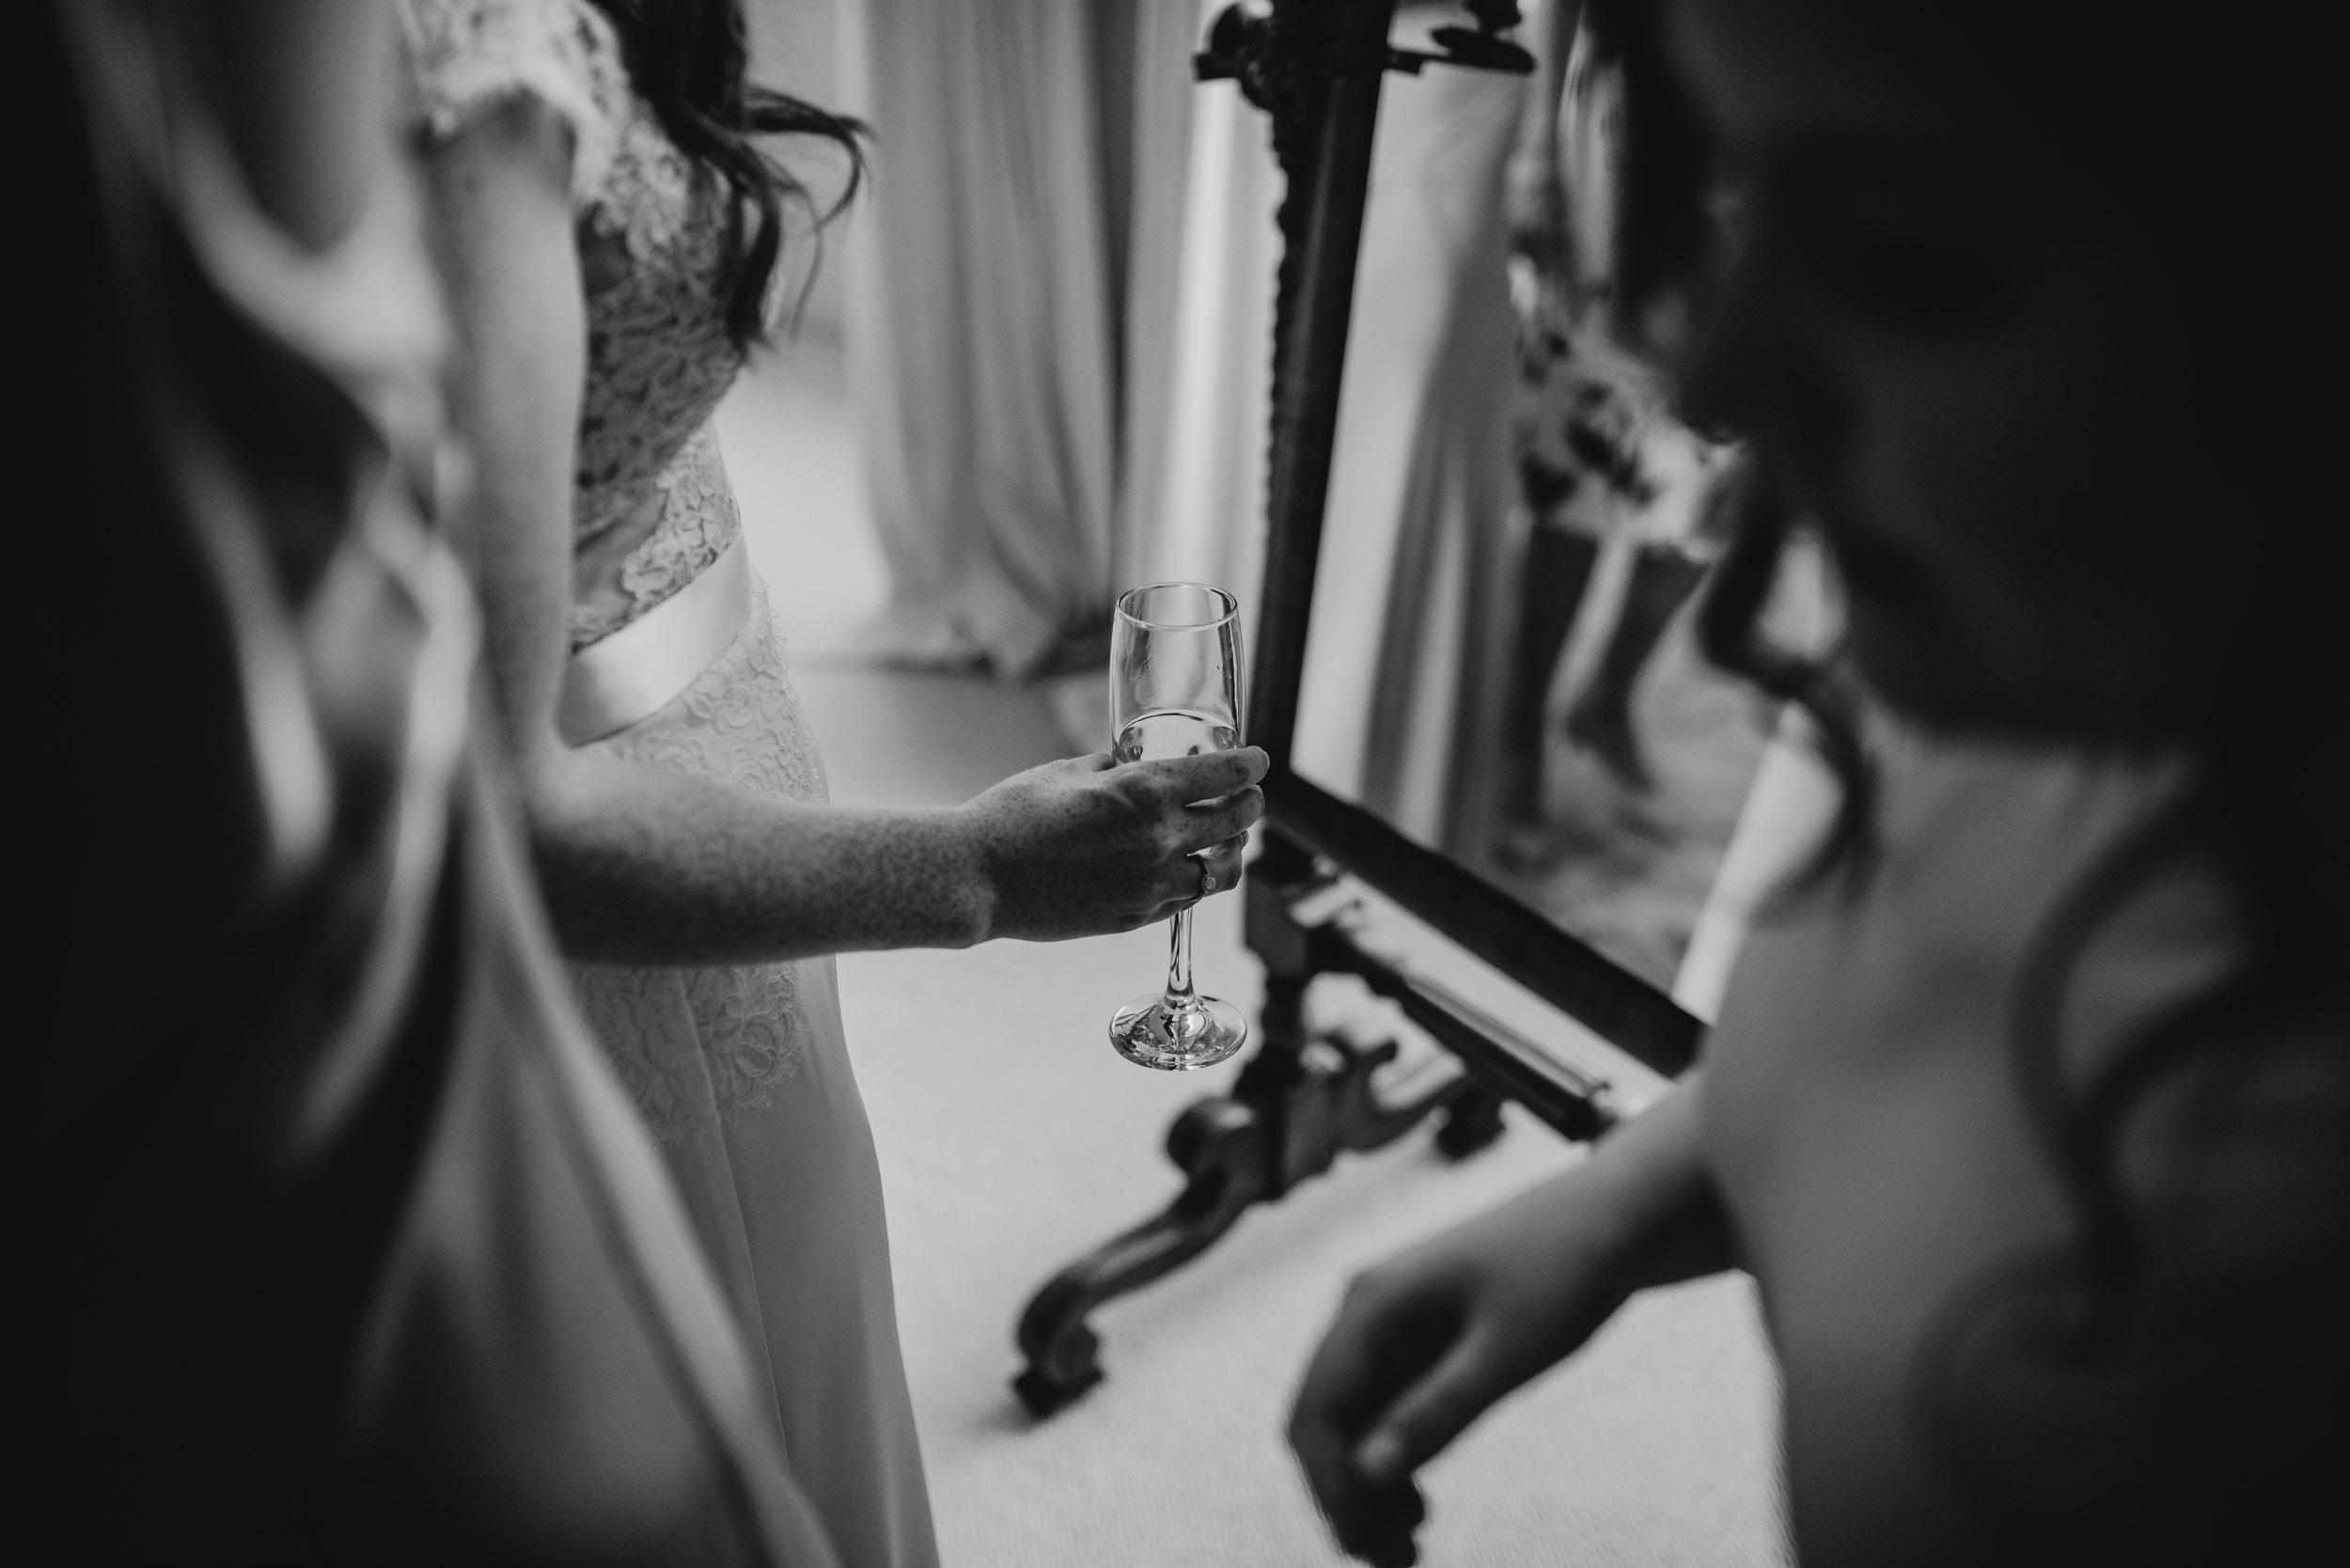 drenagh estate wedding photography-26.jpg